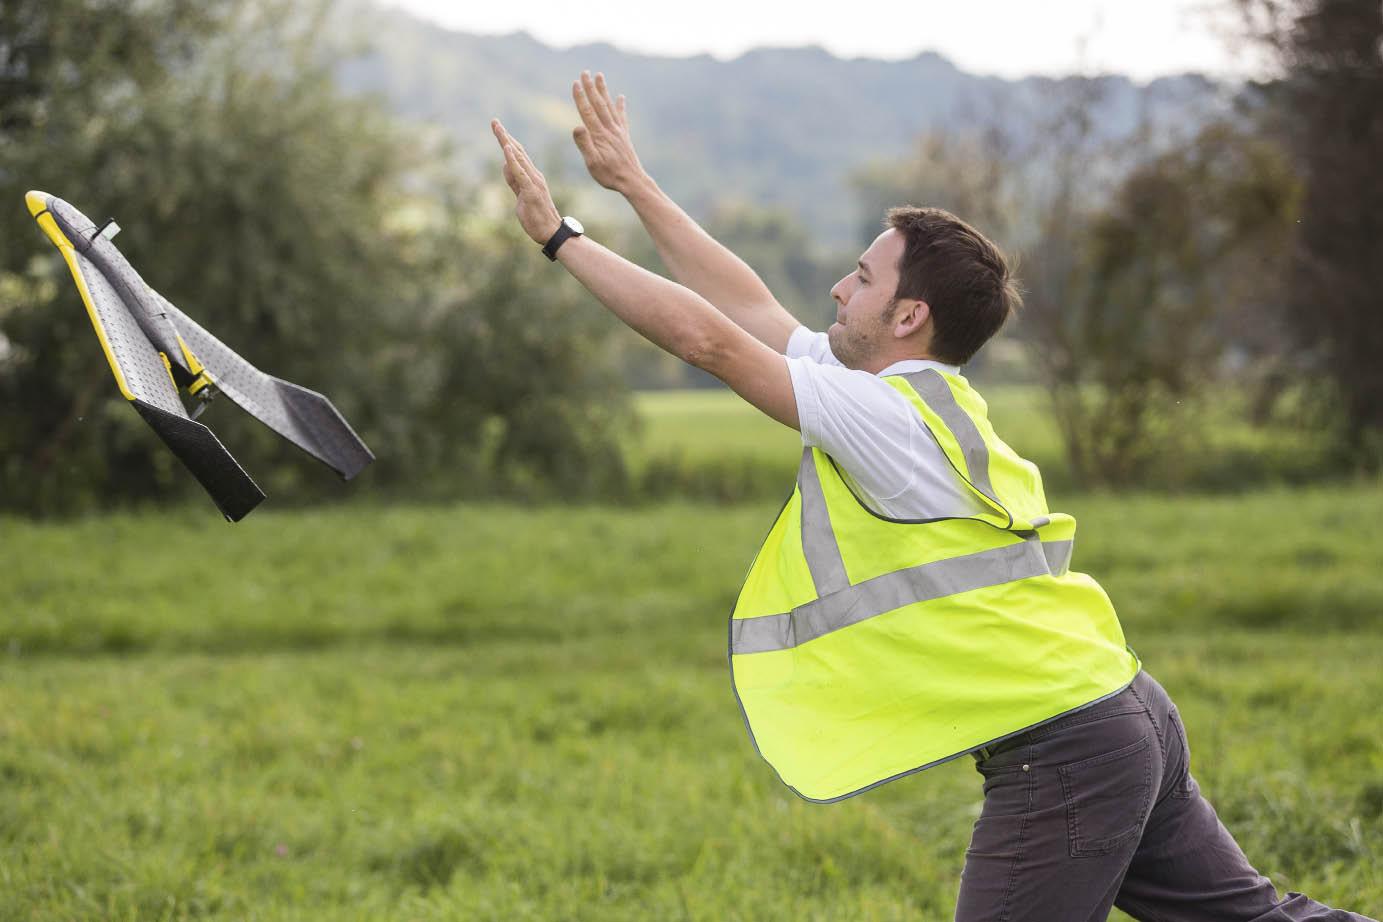 Drones : vers une pratique (presque) interdite en France ?